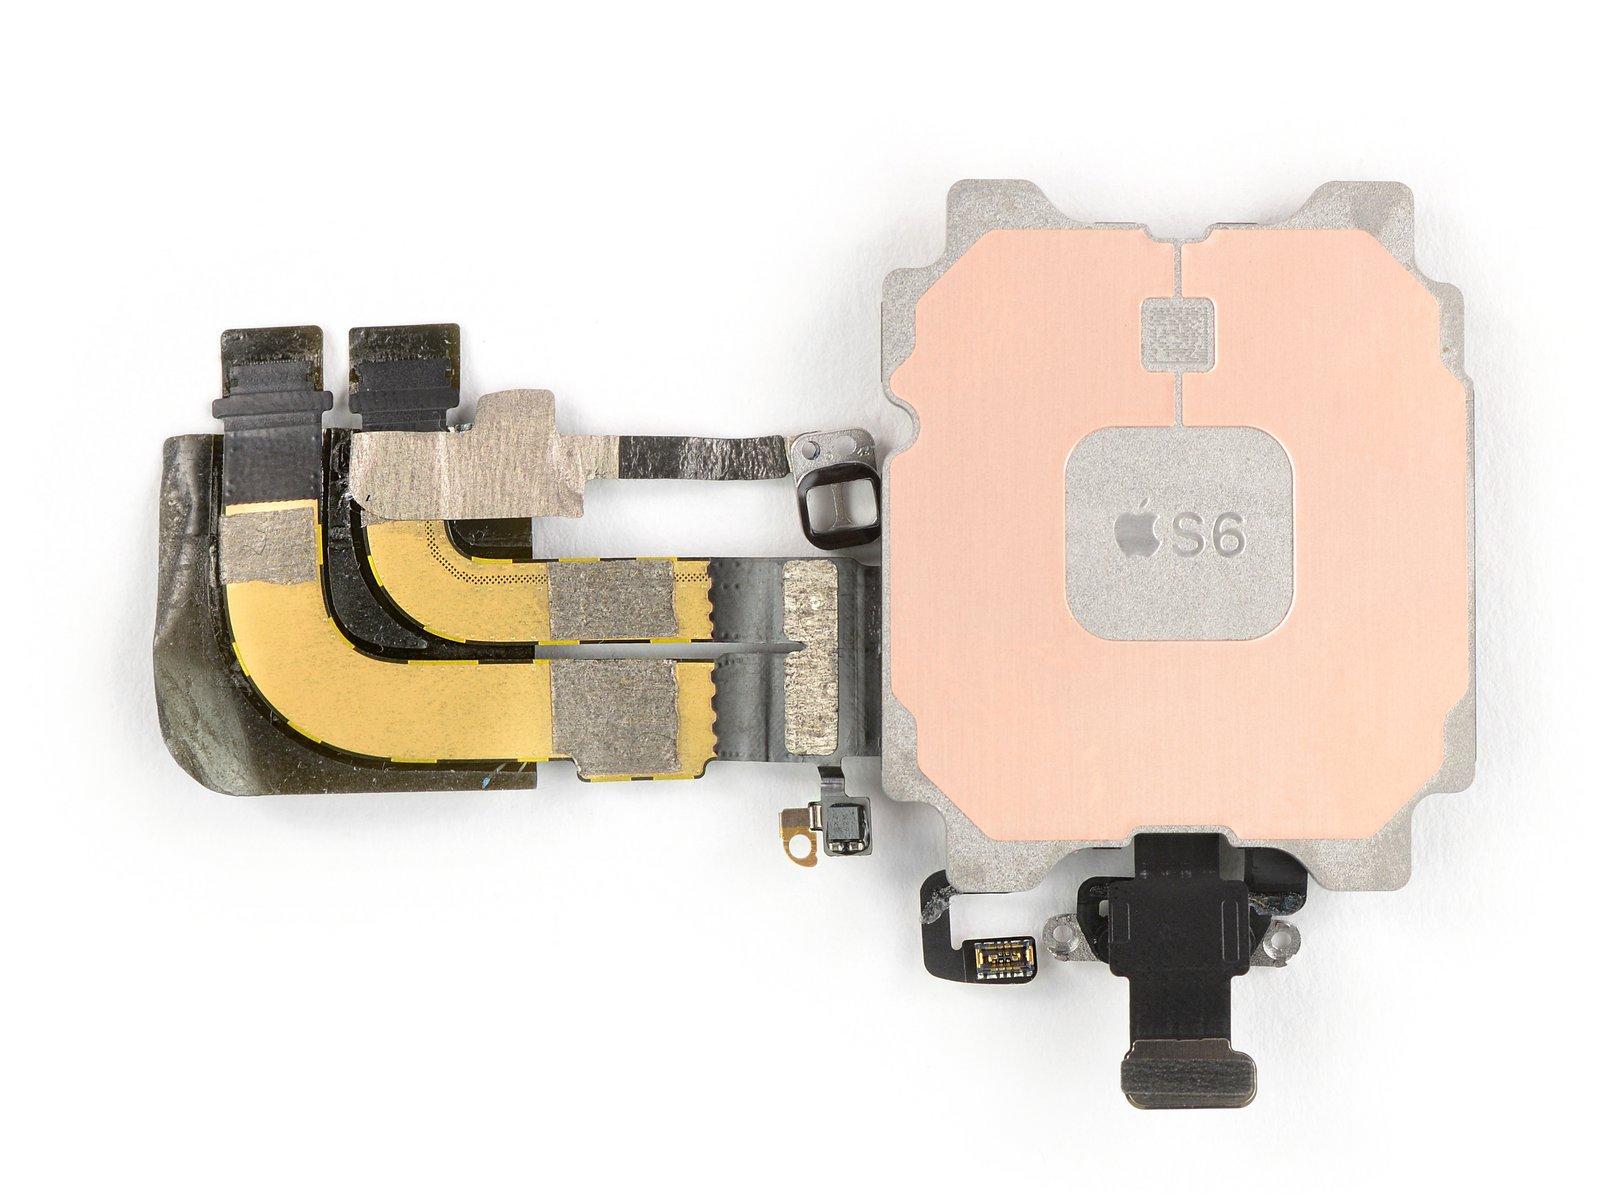 Apple Watch S6 SiP